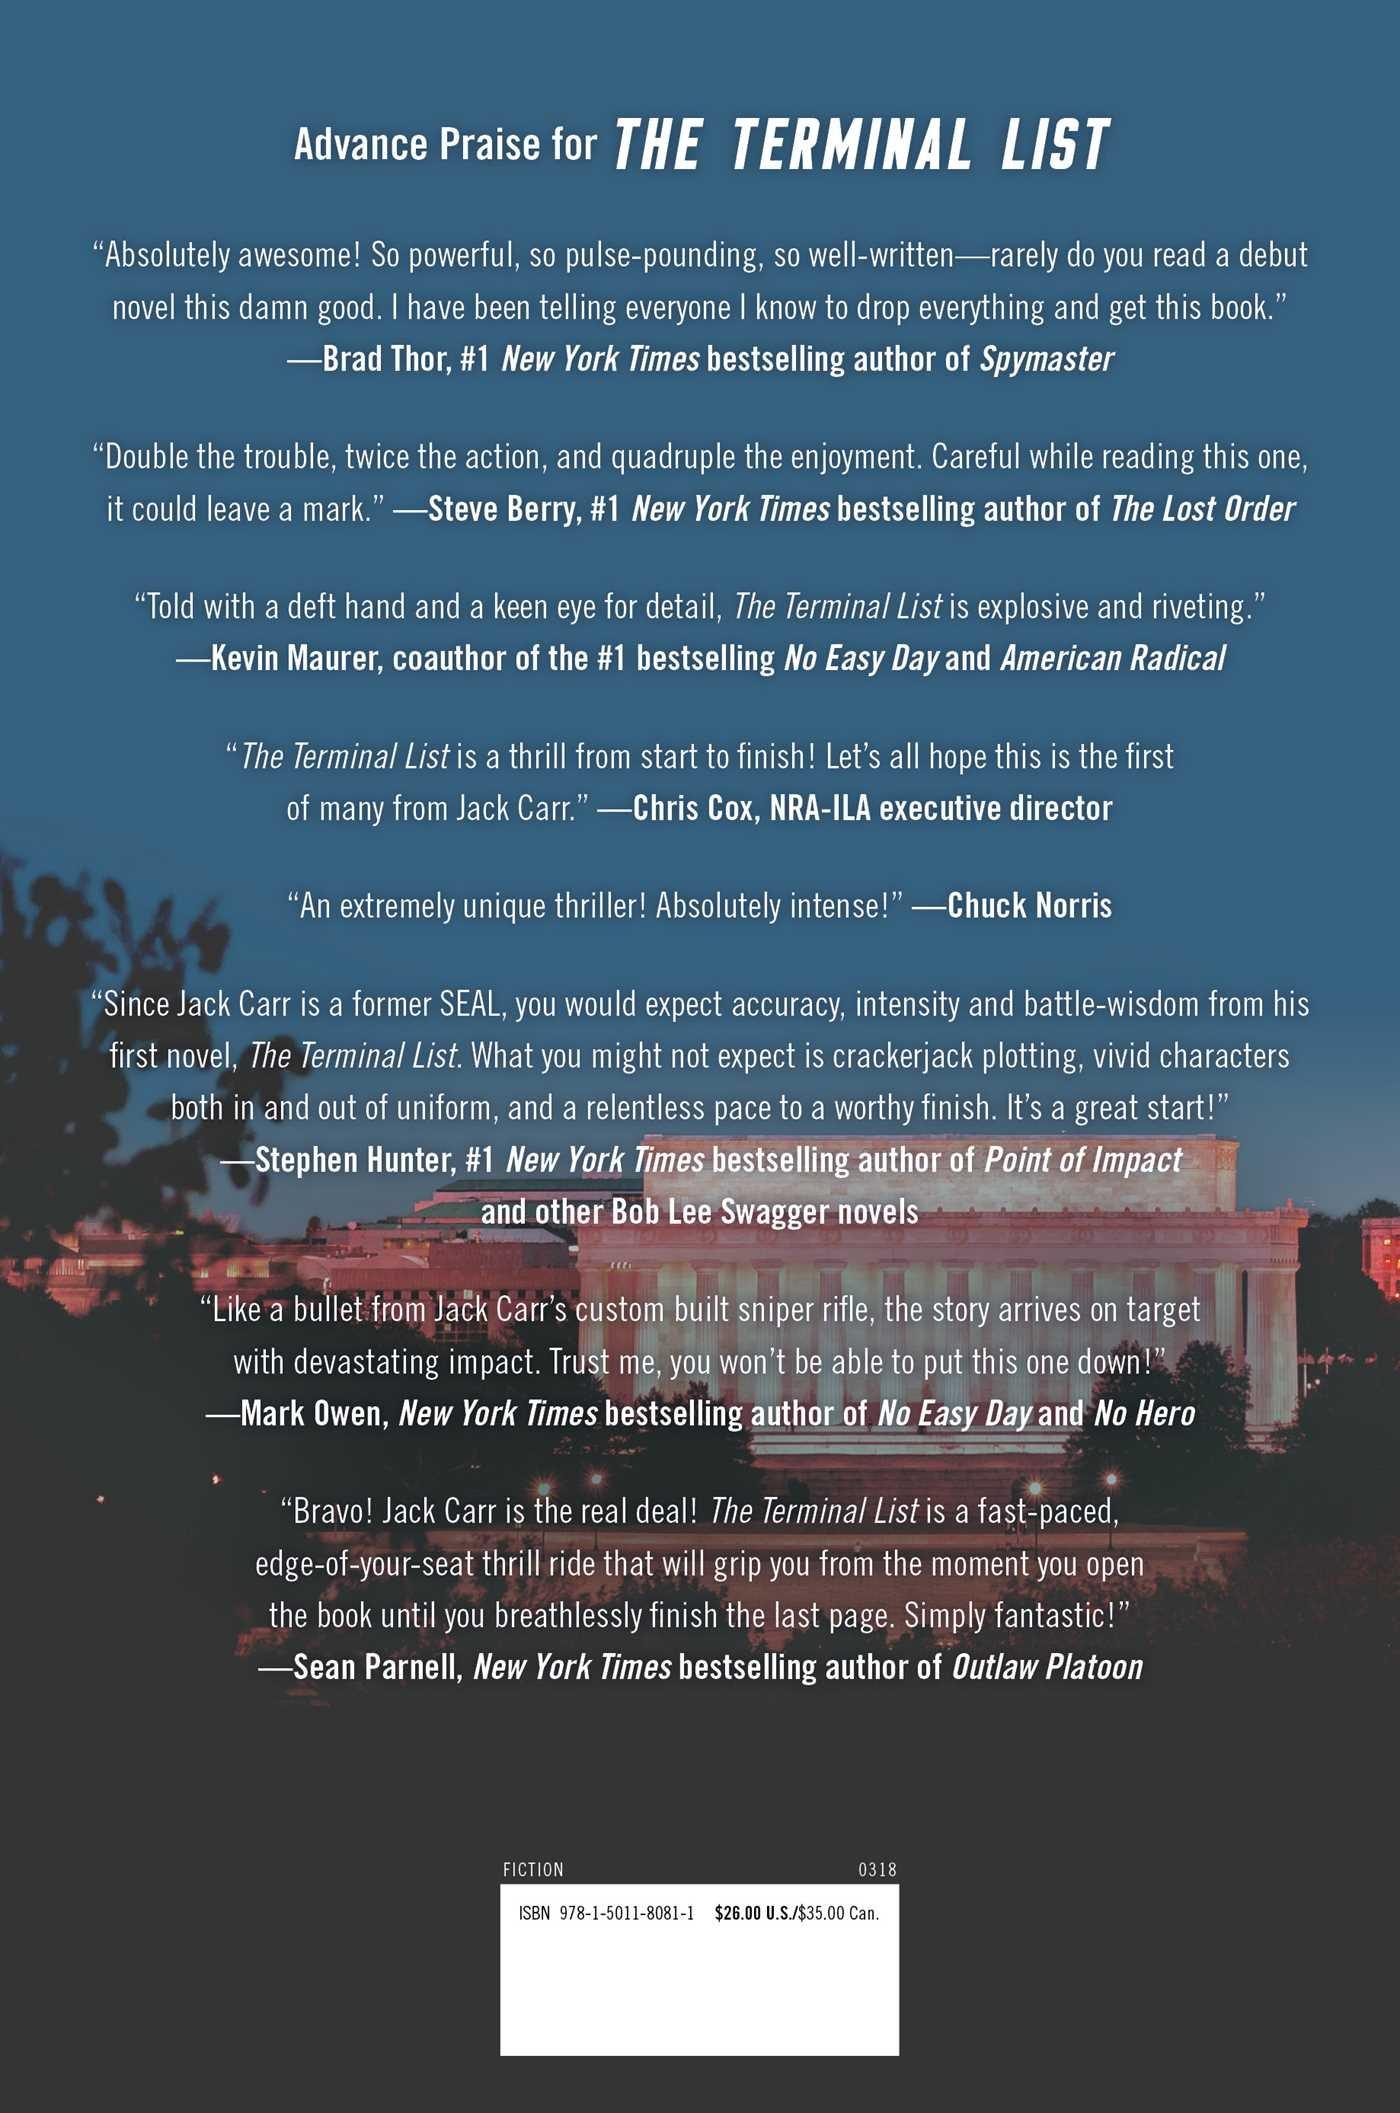 Amazon.com: The Terminal List: A Thriller (9781501180811): Jack Carr ...